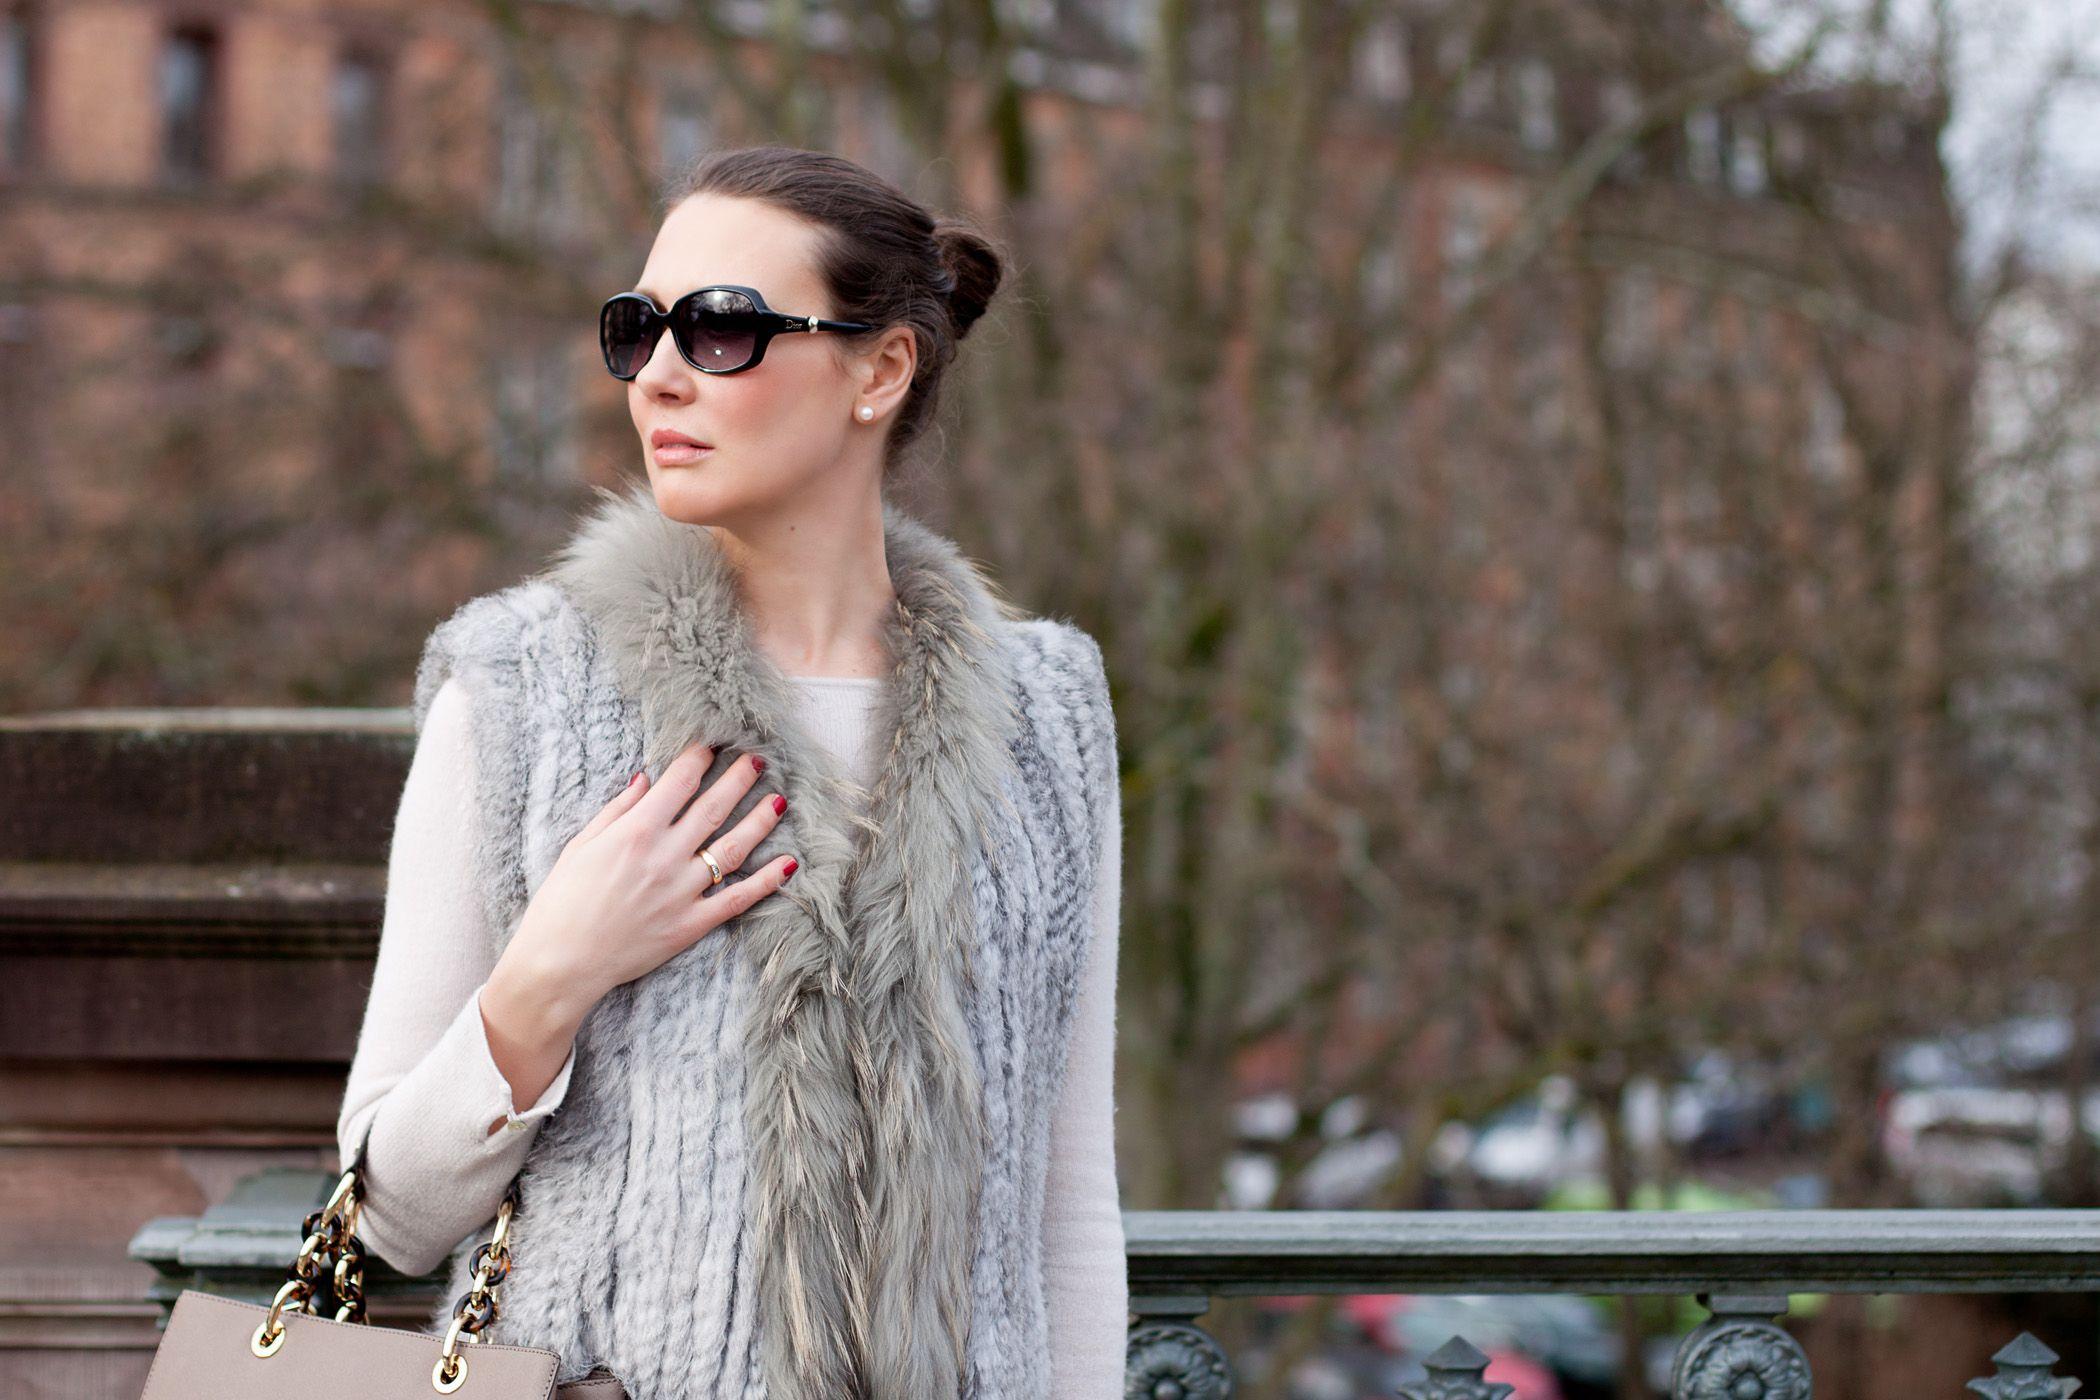 Outfitpost: Fellweste / Fur vest: Kopenhagen by Andersen | Pullover: Mrs & Hugs | Hose / leggins: Bloom | Sneaker: Lanvin | Tasche / bag: Michael Kors - Foto 09